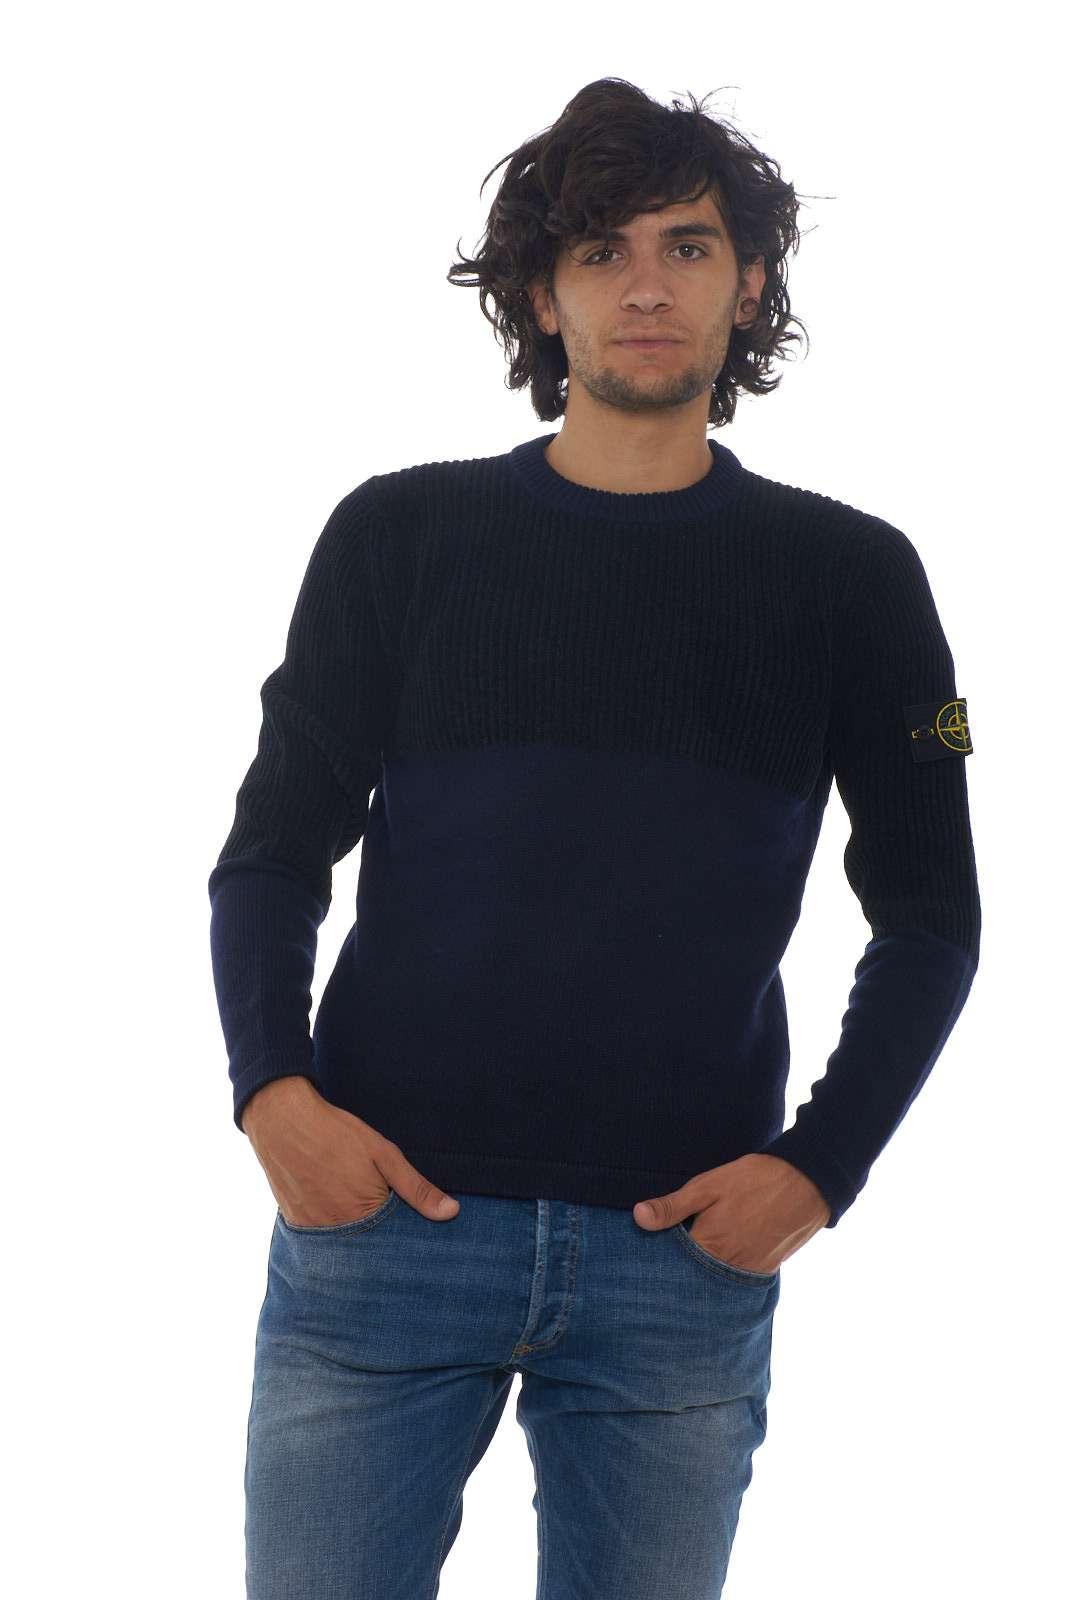 https://www.parmax.com/media/catalog/product/a/i/AI-outlet_parmax-maglia-uomo-Stone-Island-7115520B8-A_1.jpg